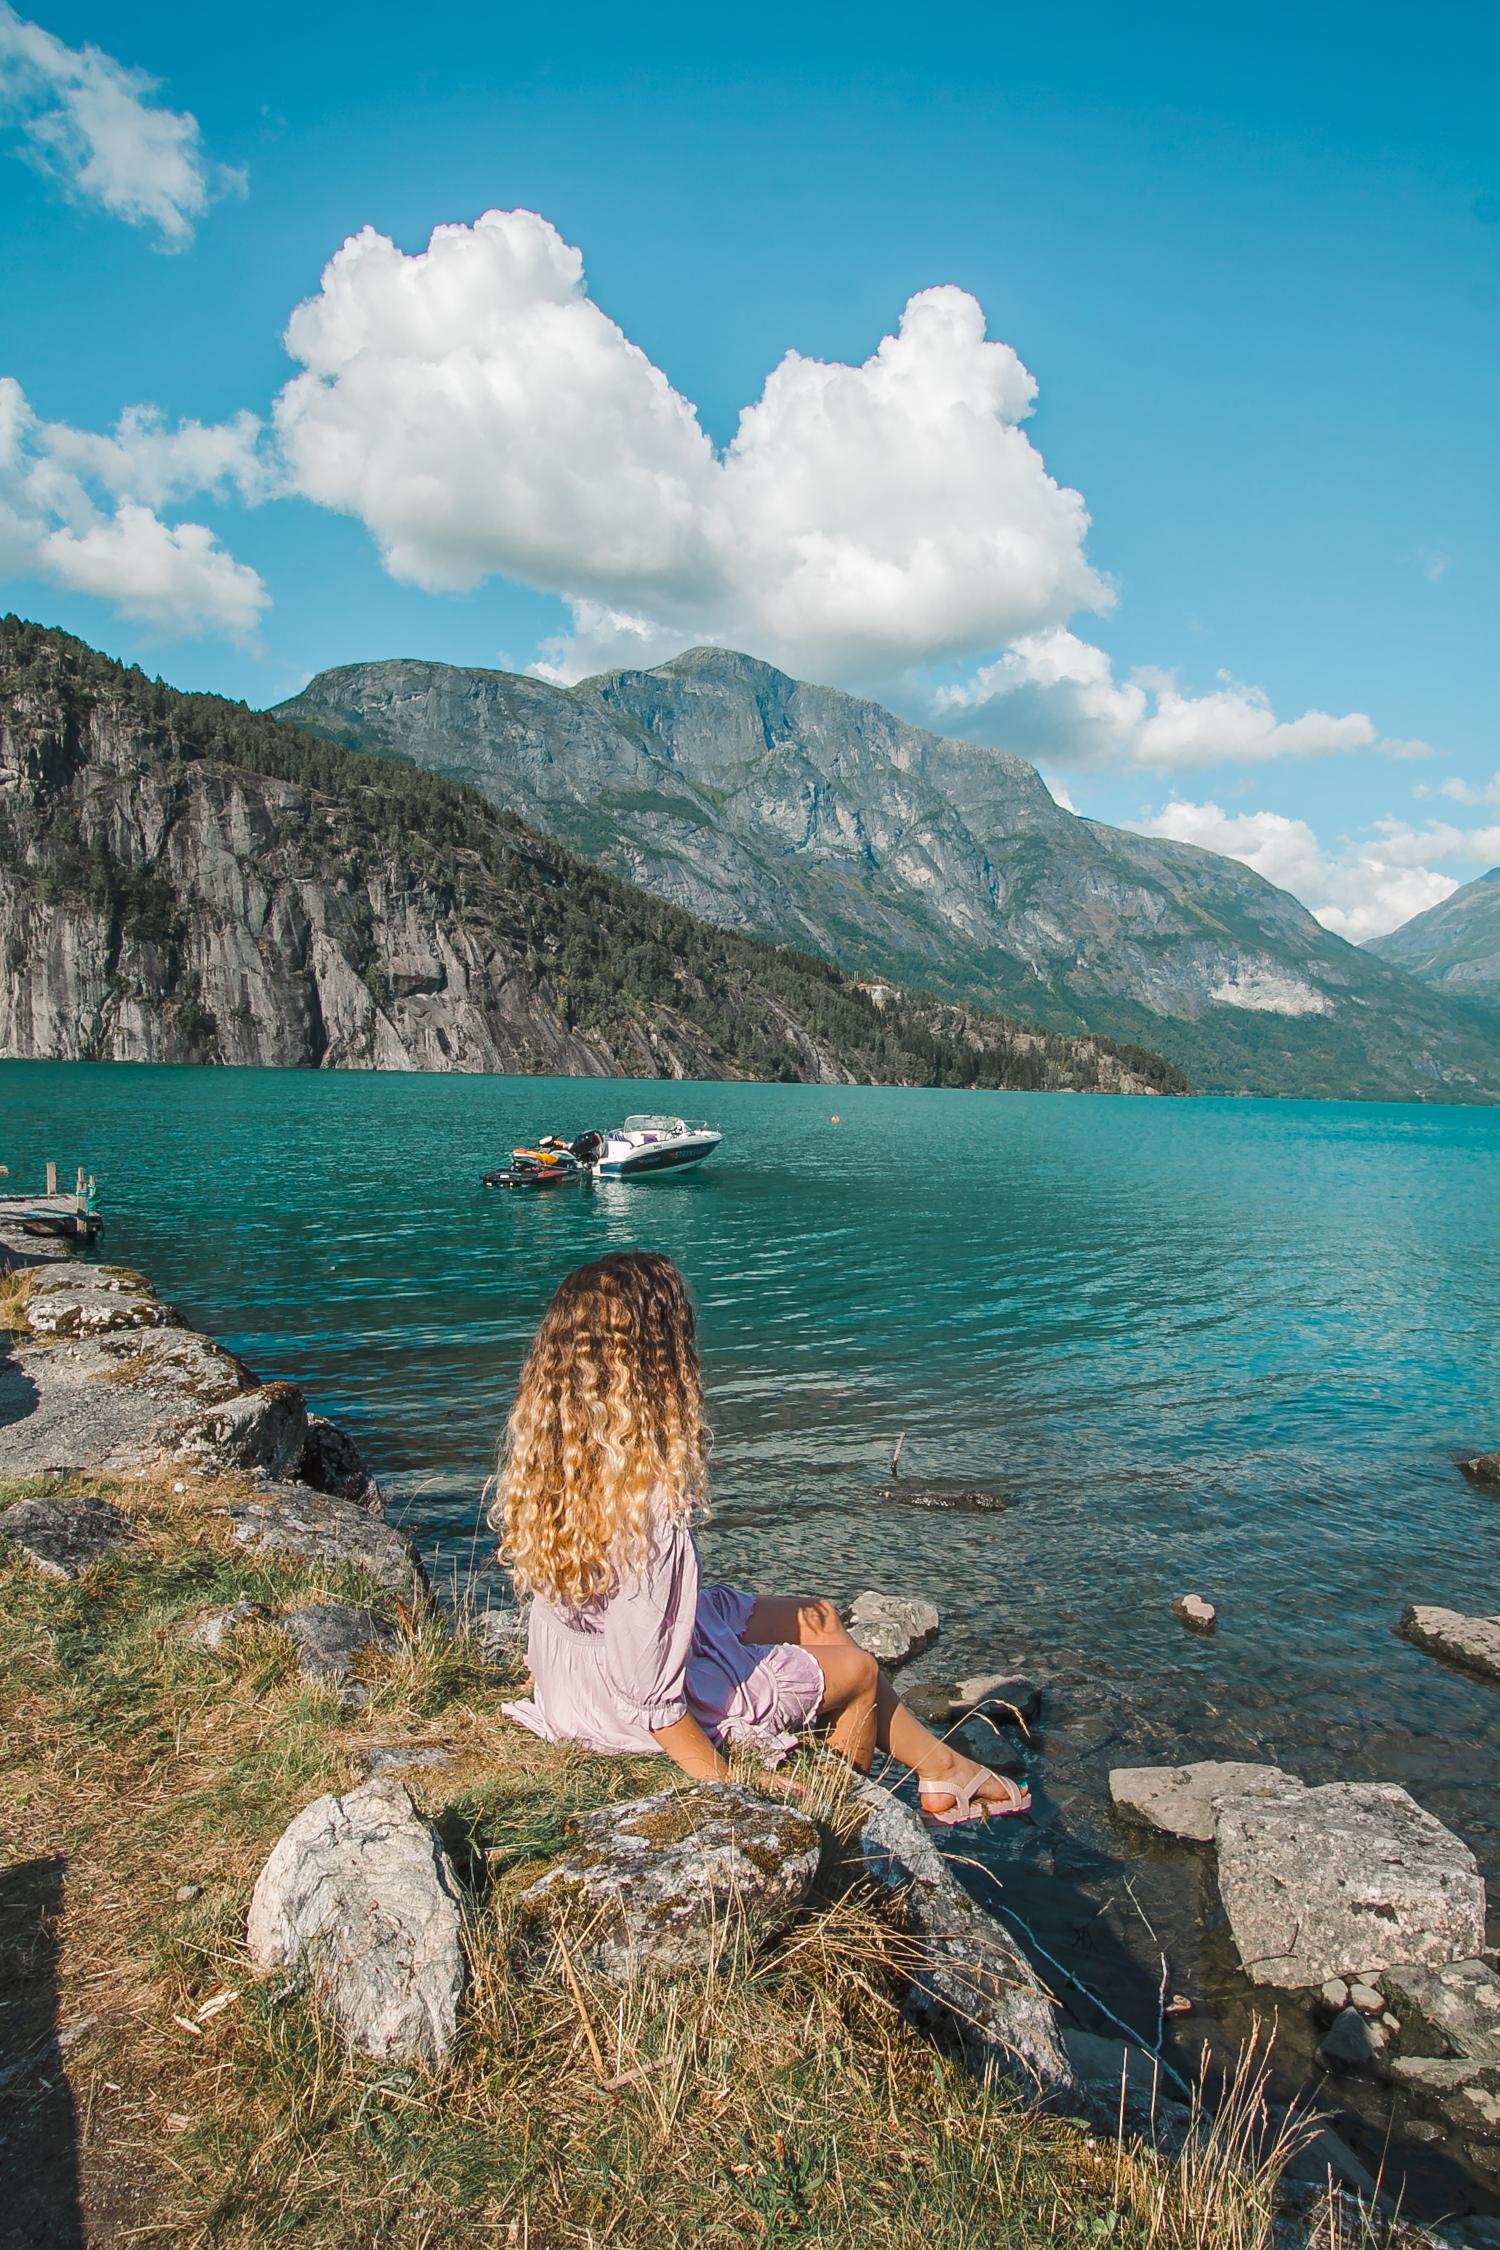 Strynsvatn camping norwegia wycieczka